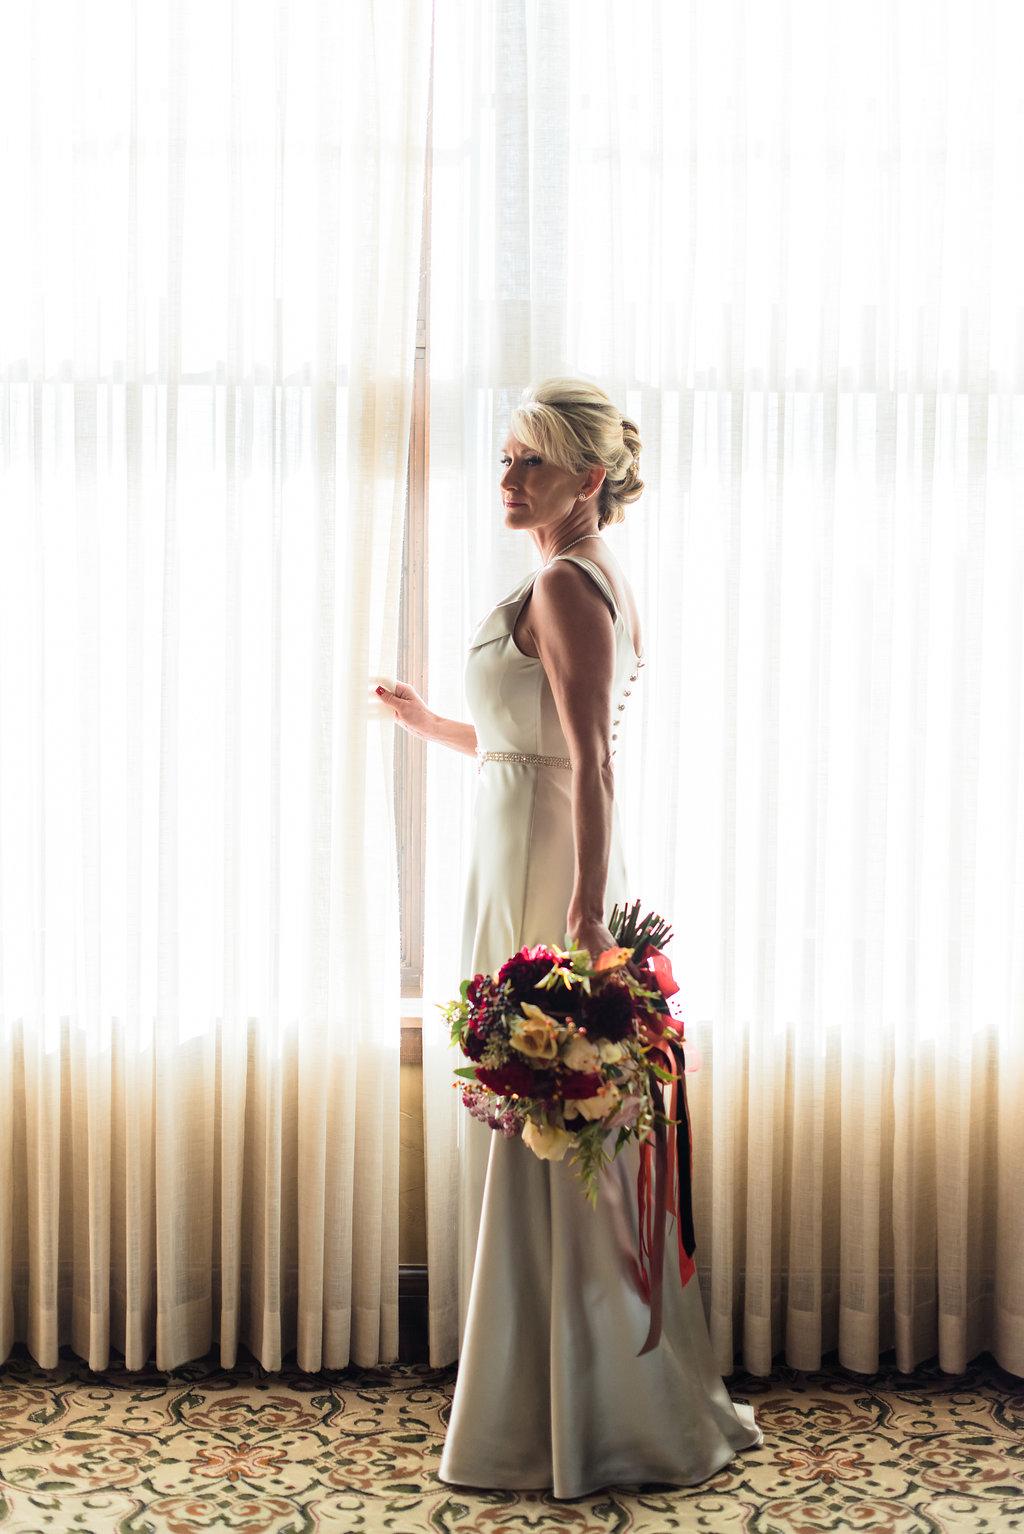 Bridalbliss.com | Bend Wedding | Central Oregon Event Planning and Design | Benjamin Edwards Photography